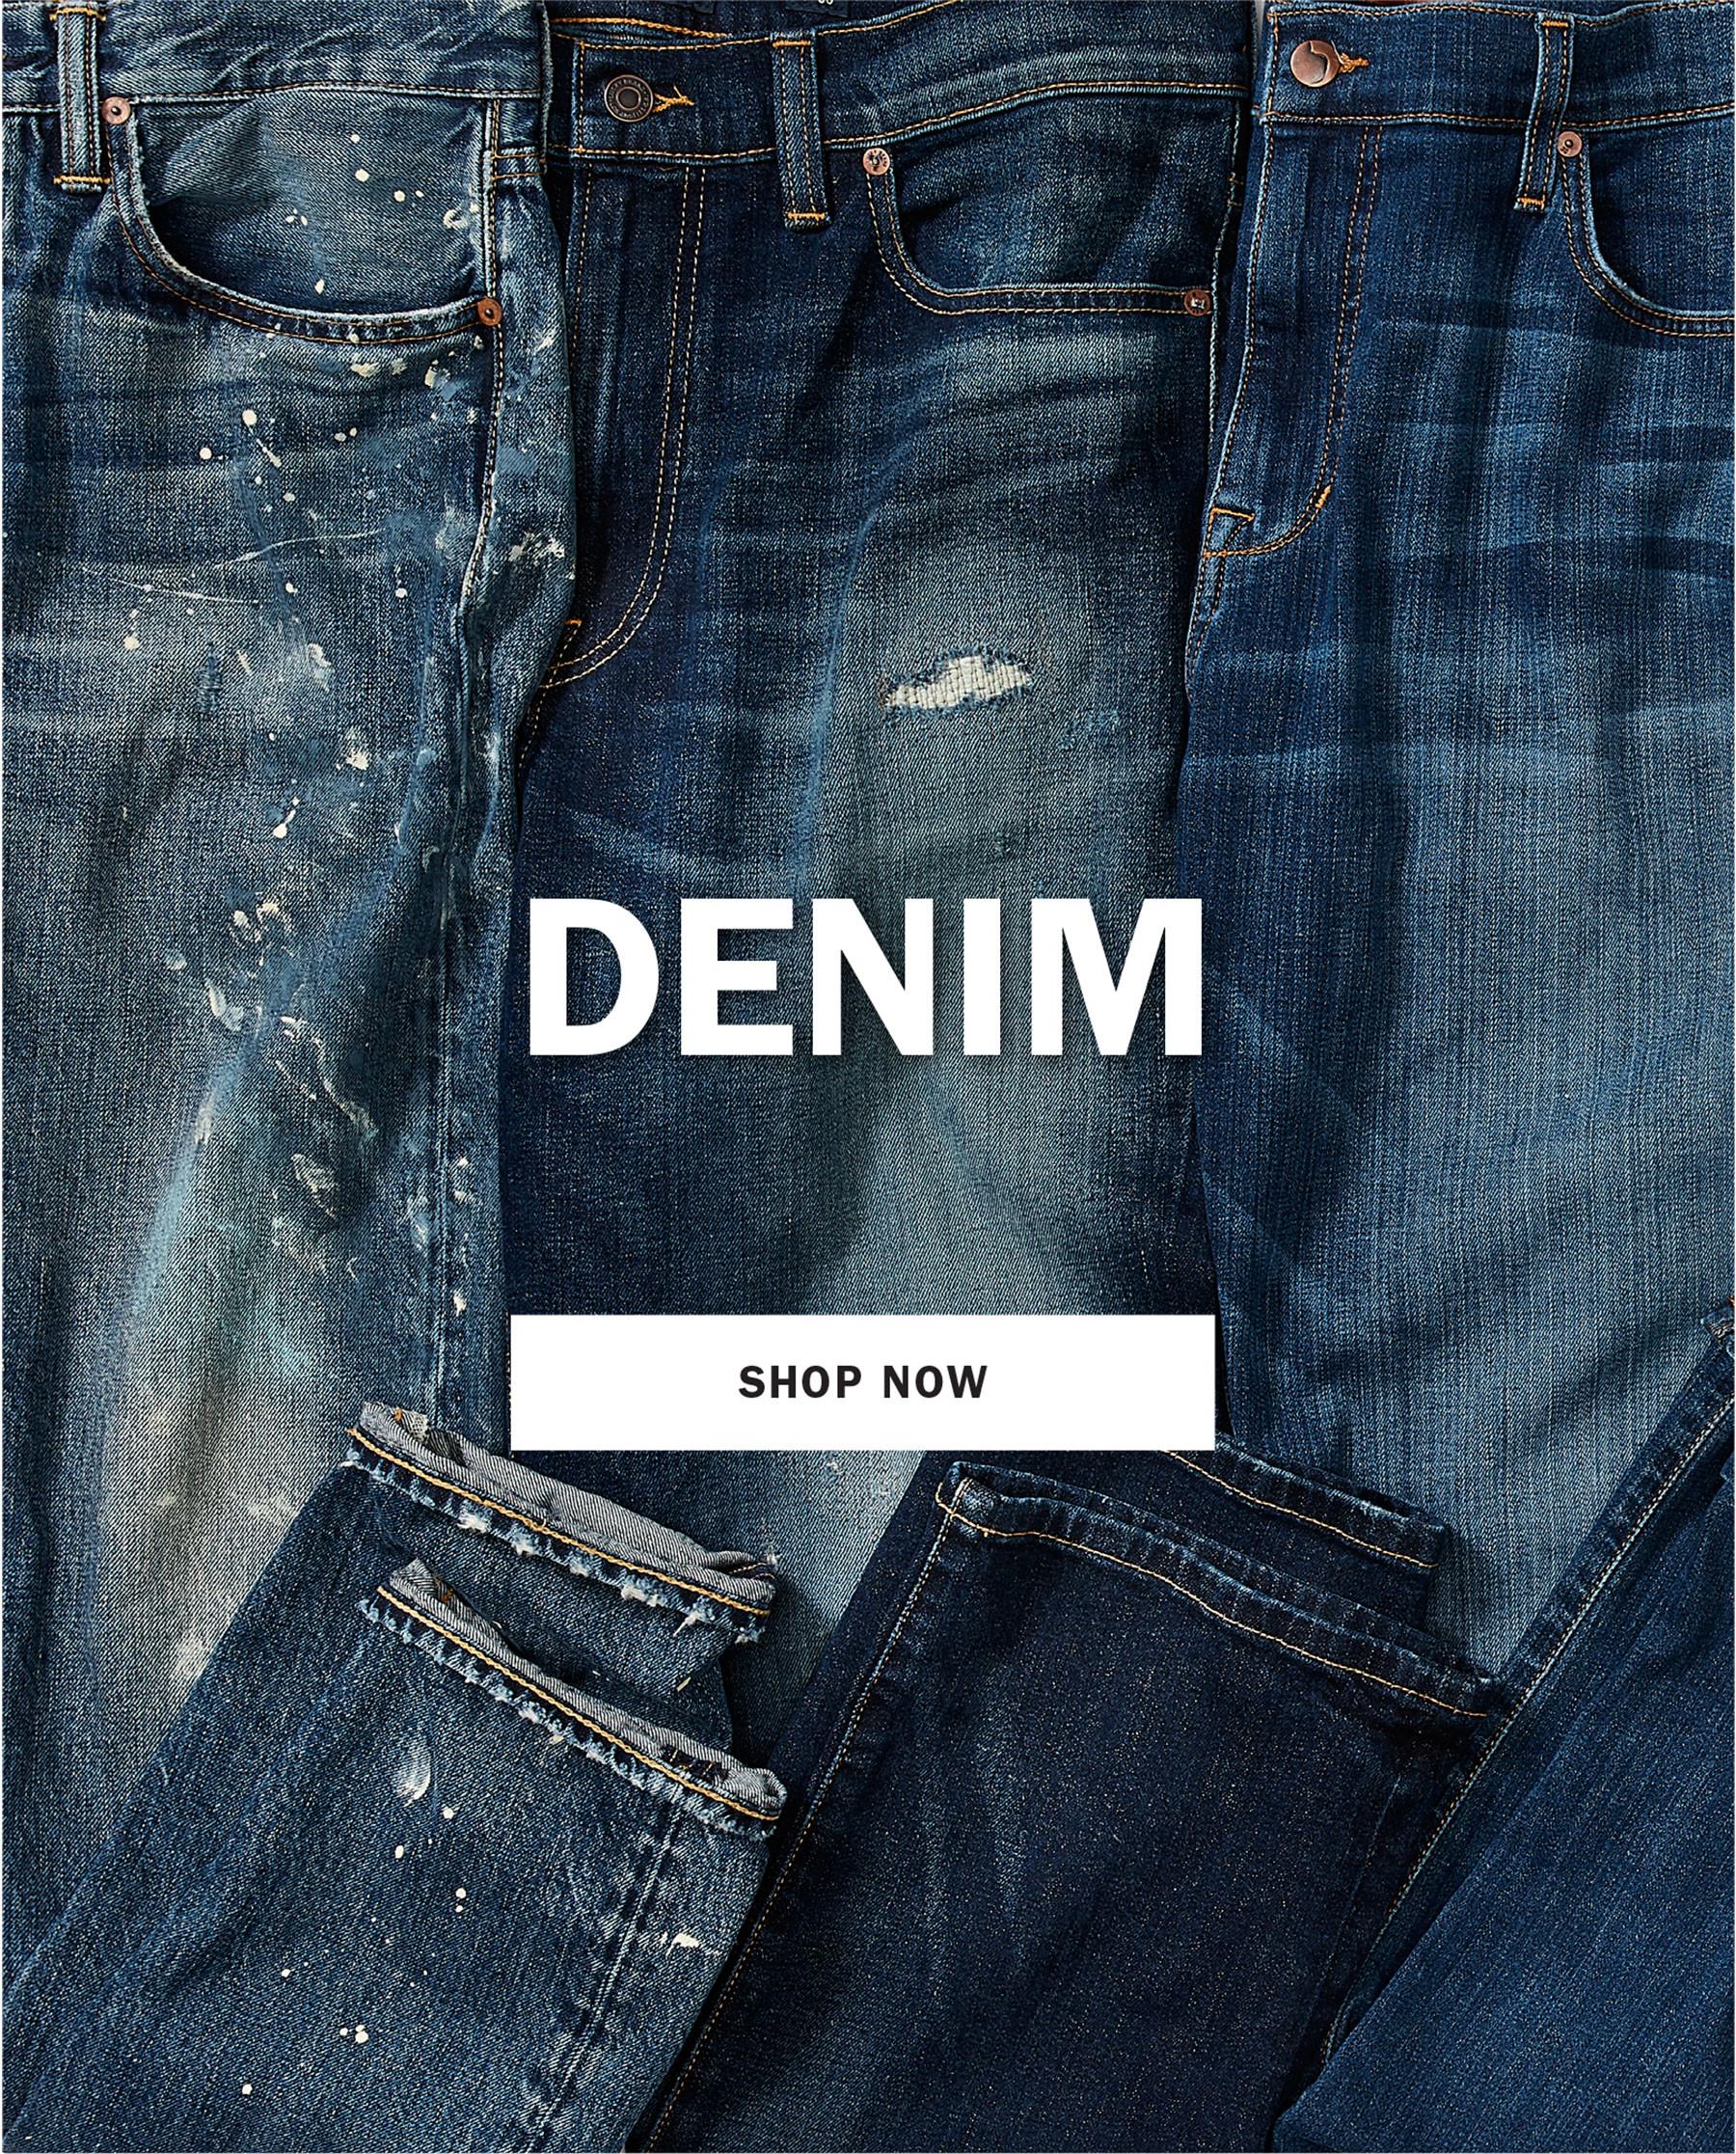 DENIM | SHOP NOW